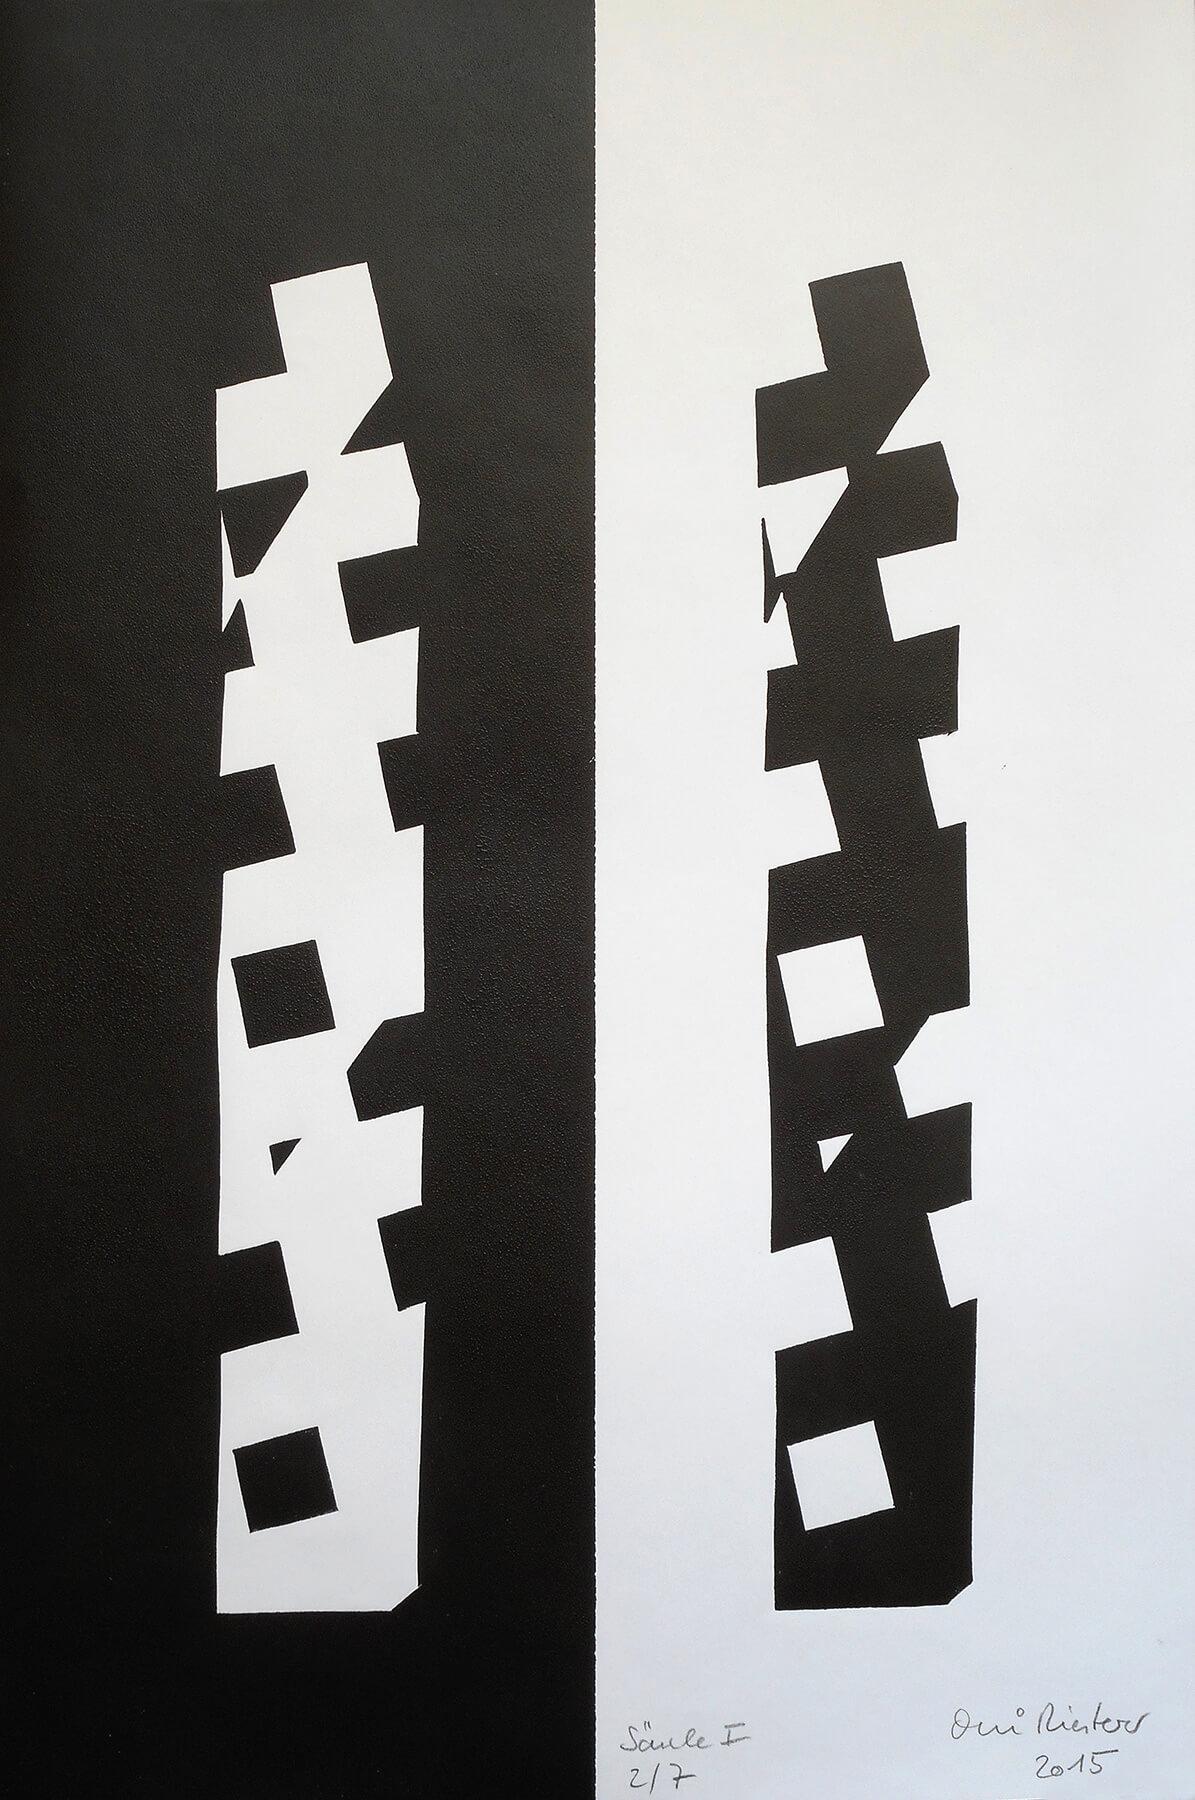 OMI Riesterer Grafik Karlsruhe Säule Hochdruck